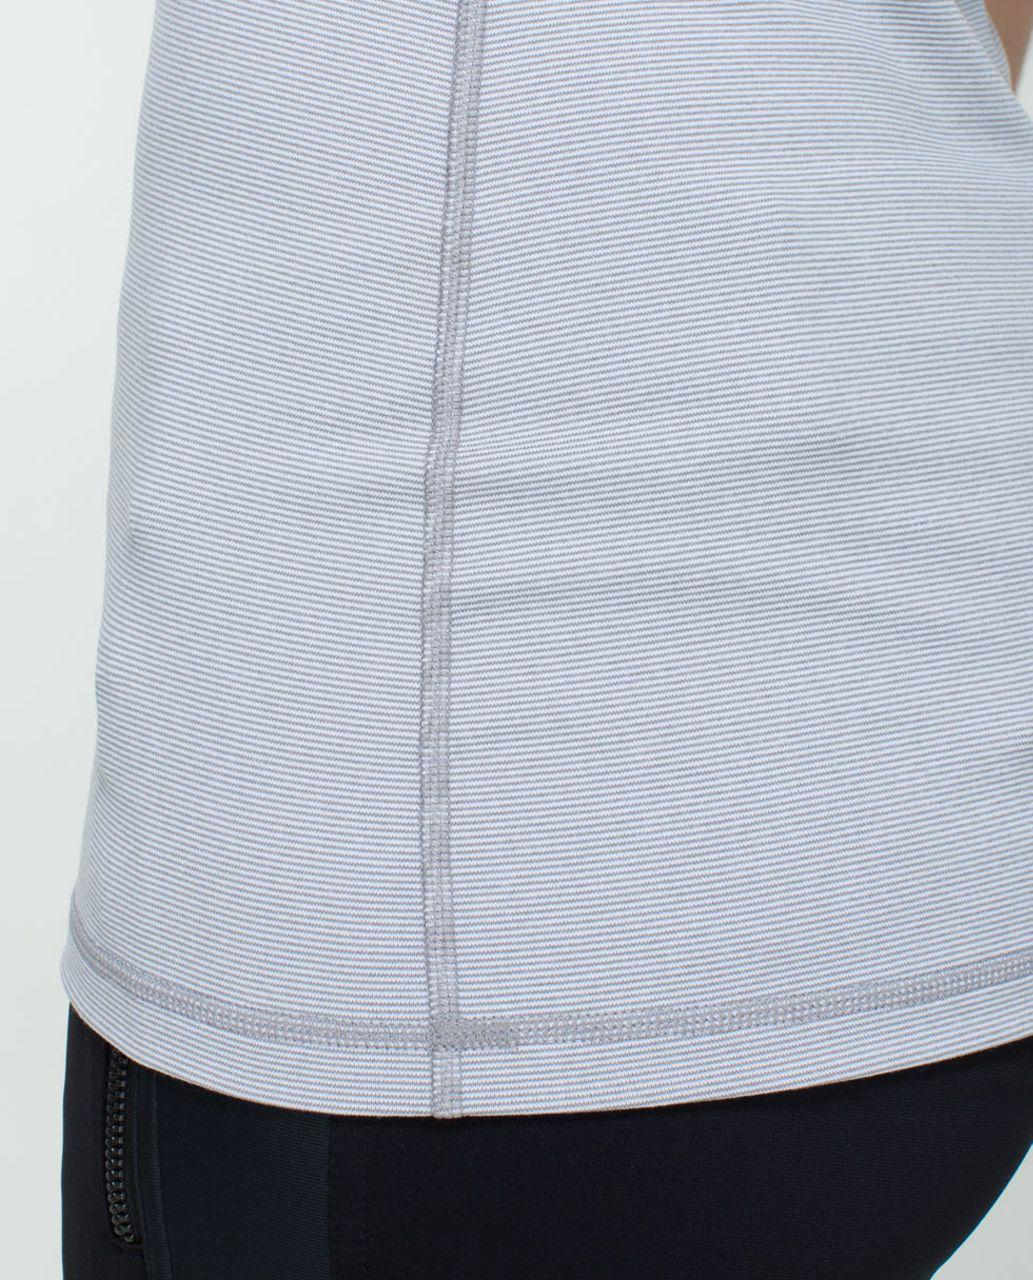 Lululemon Power Y Tank *Luon - Wee Stripe White Heathered Medium Grey